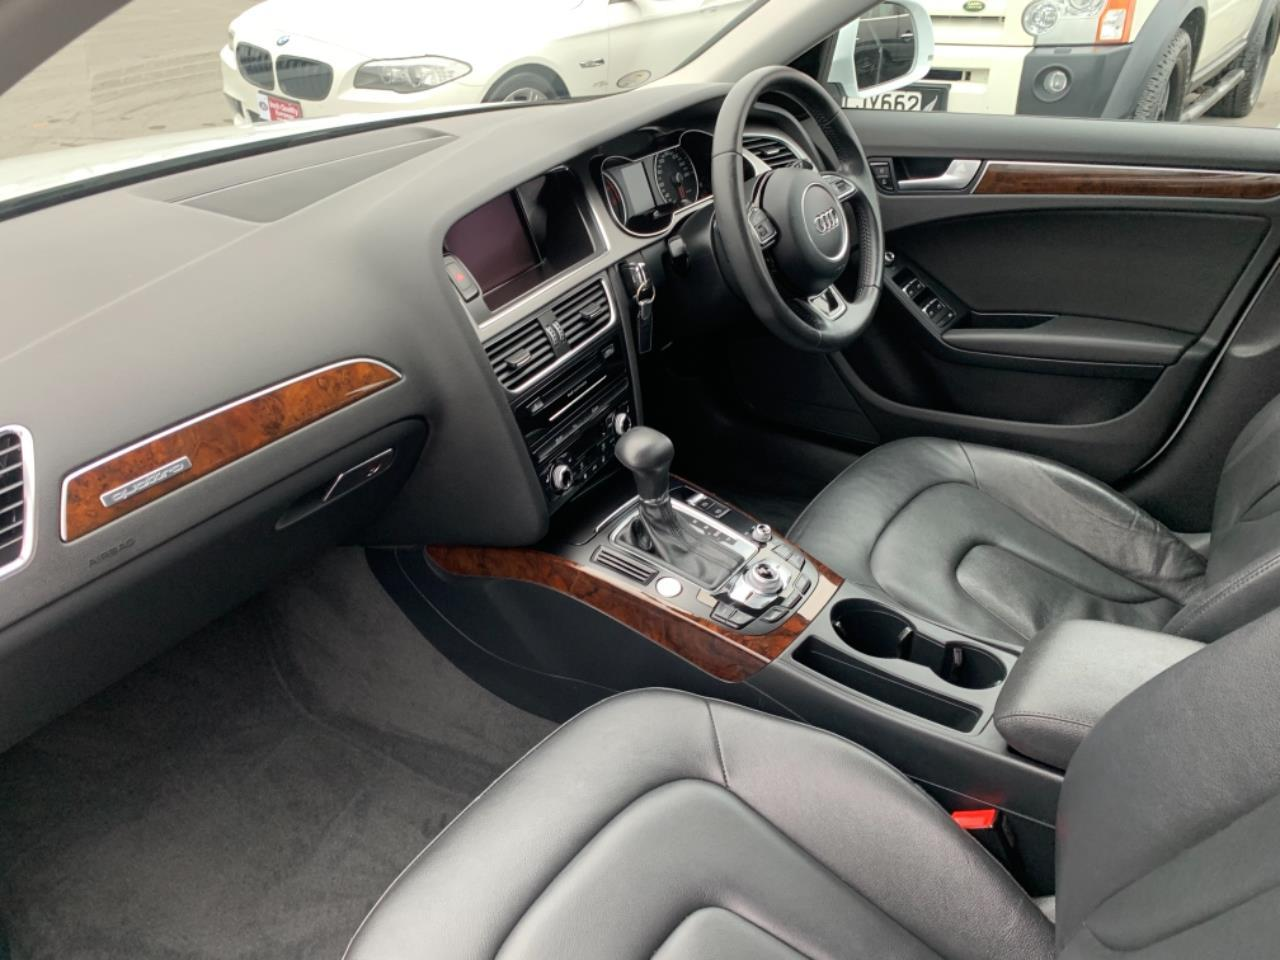 image-5, 2012 Audi A4 Allroad Quattro at Christchurch